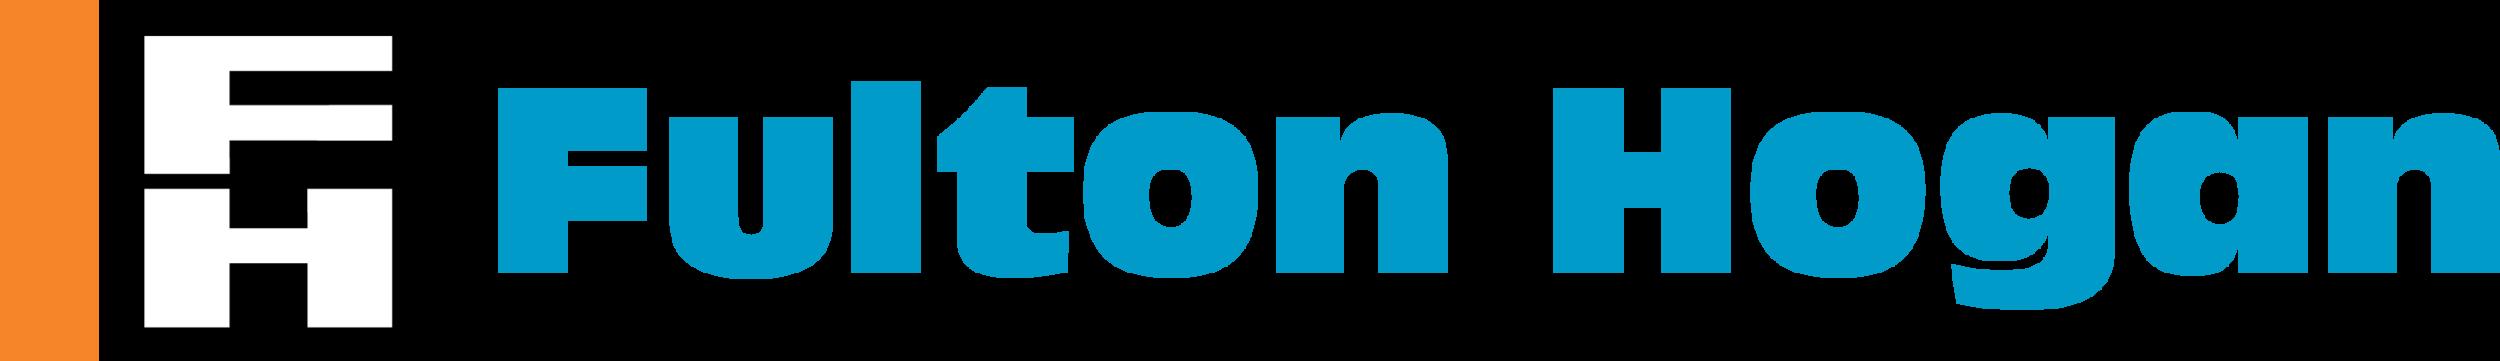 Fulton Hogan CMYK logo.png